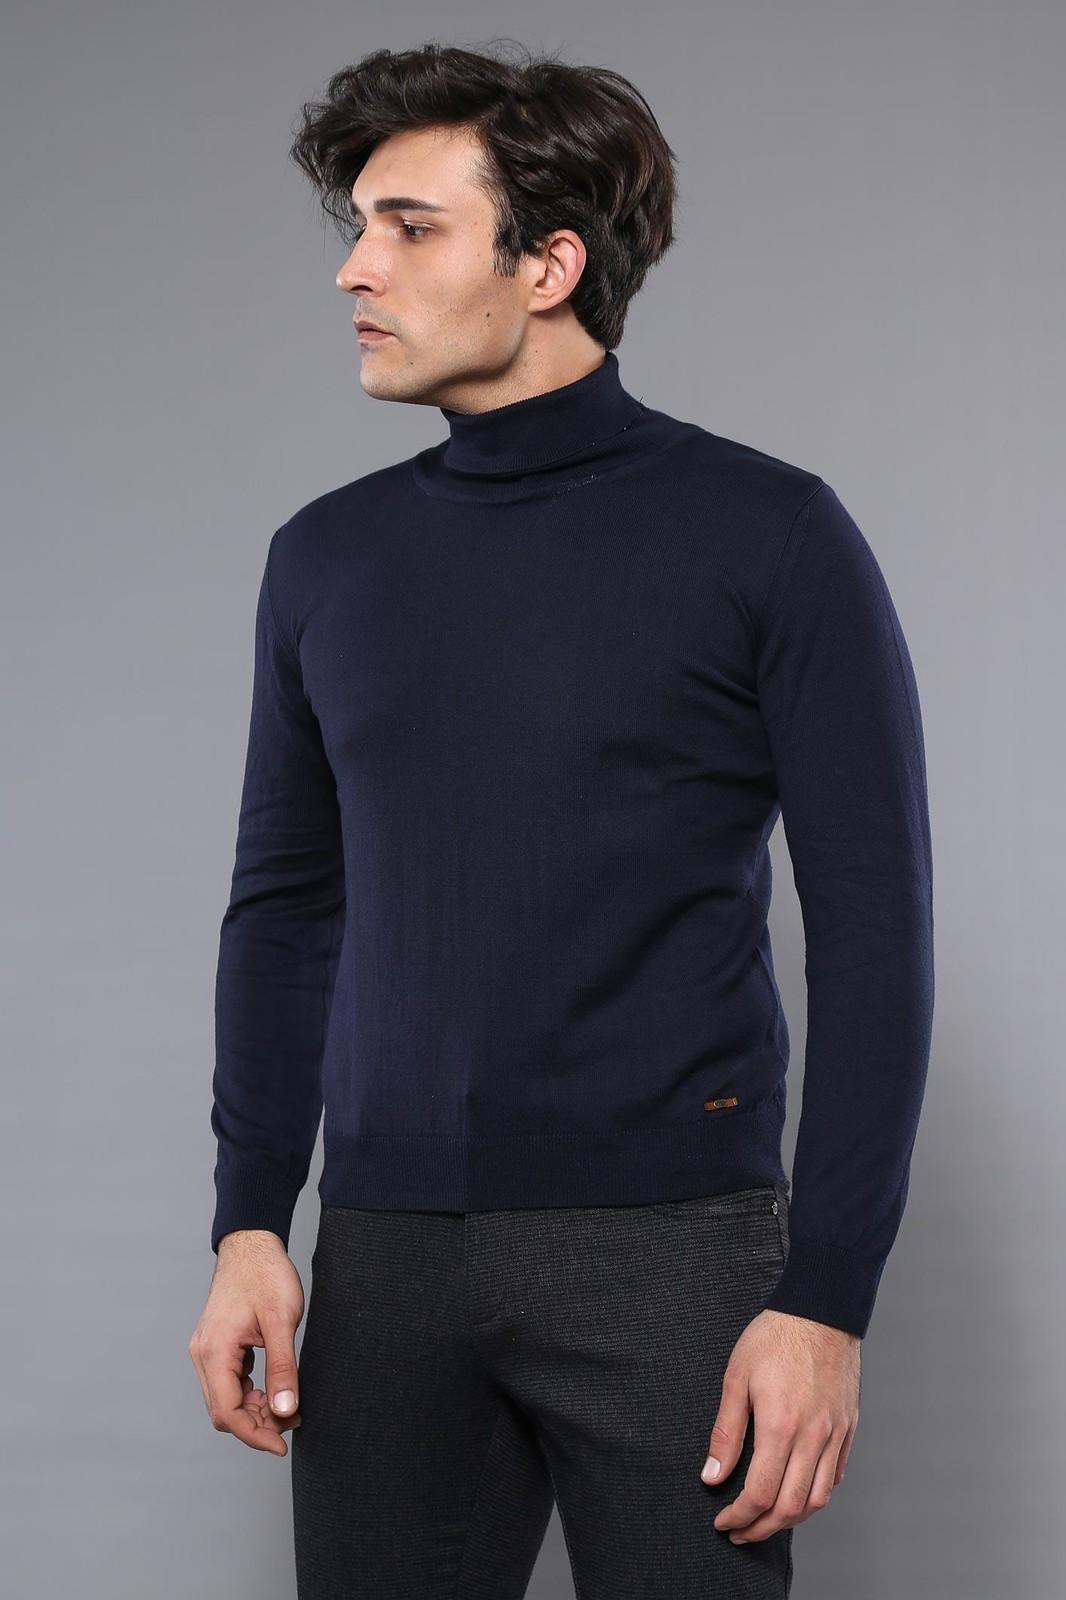 Men's Turtleneck Navy Blue Tricot Sweater